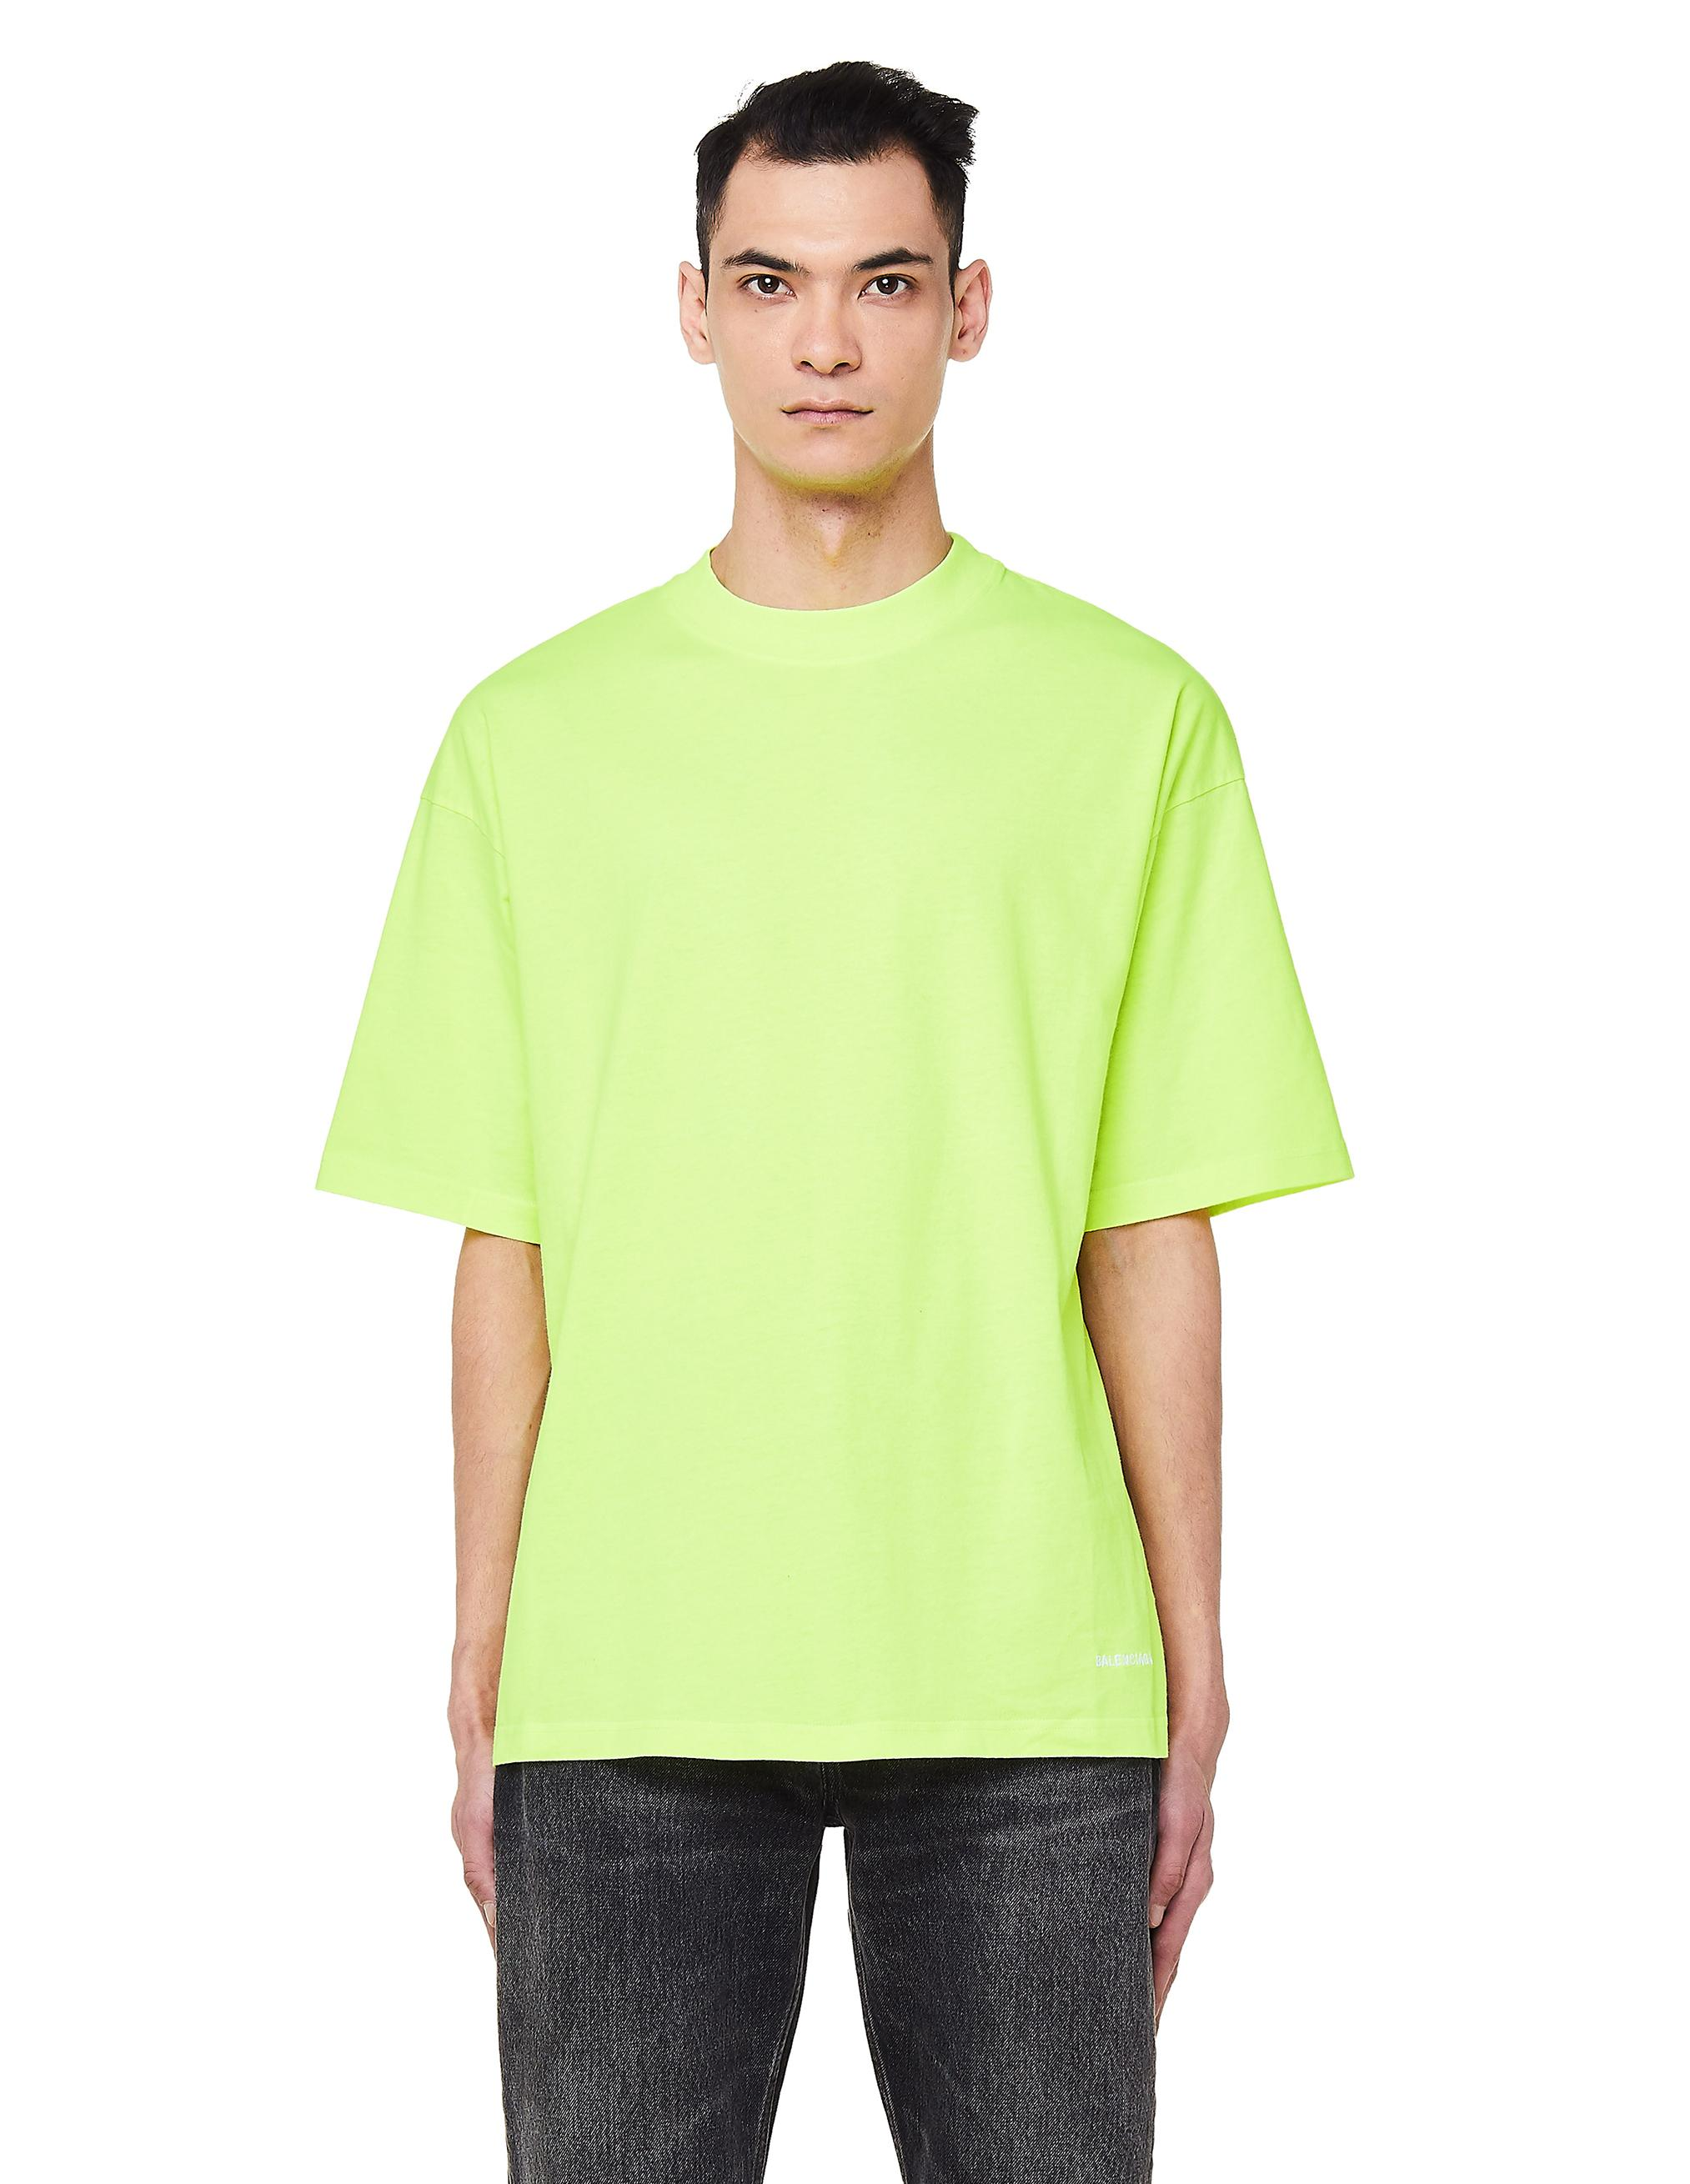 bc0c700d Balenciaga Neon Yellow Cotton T-shirt in Yellow for Men - Lyst